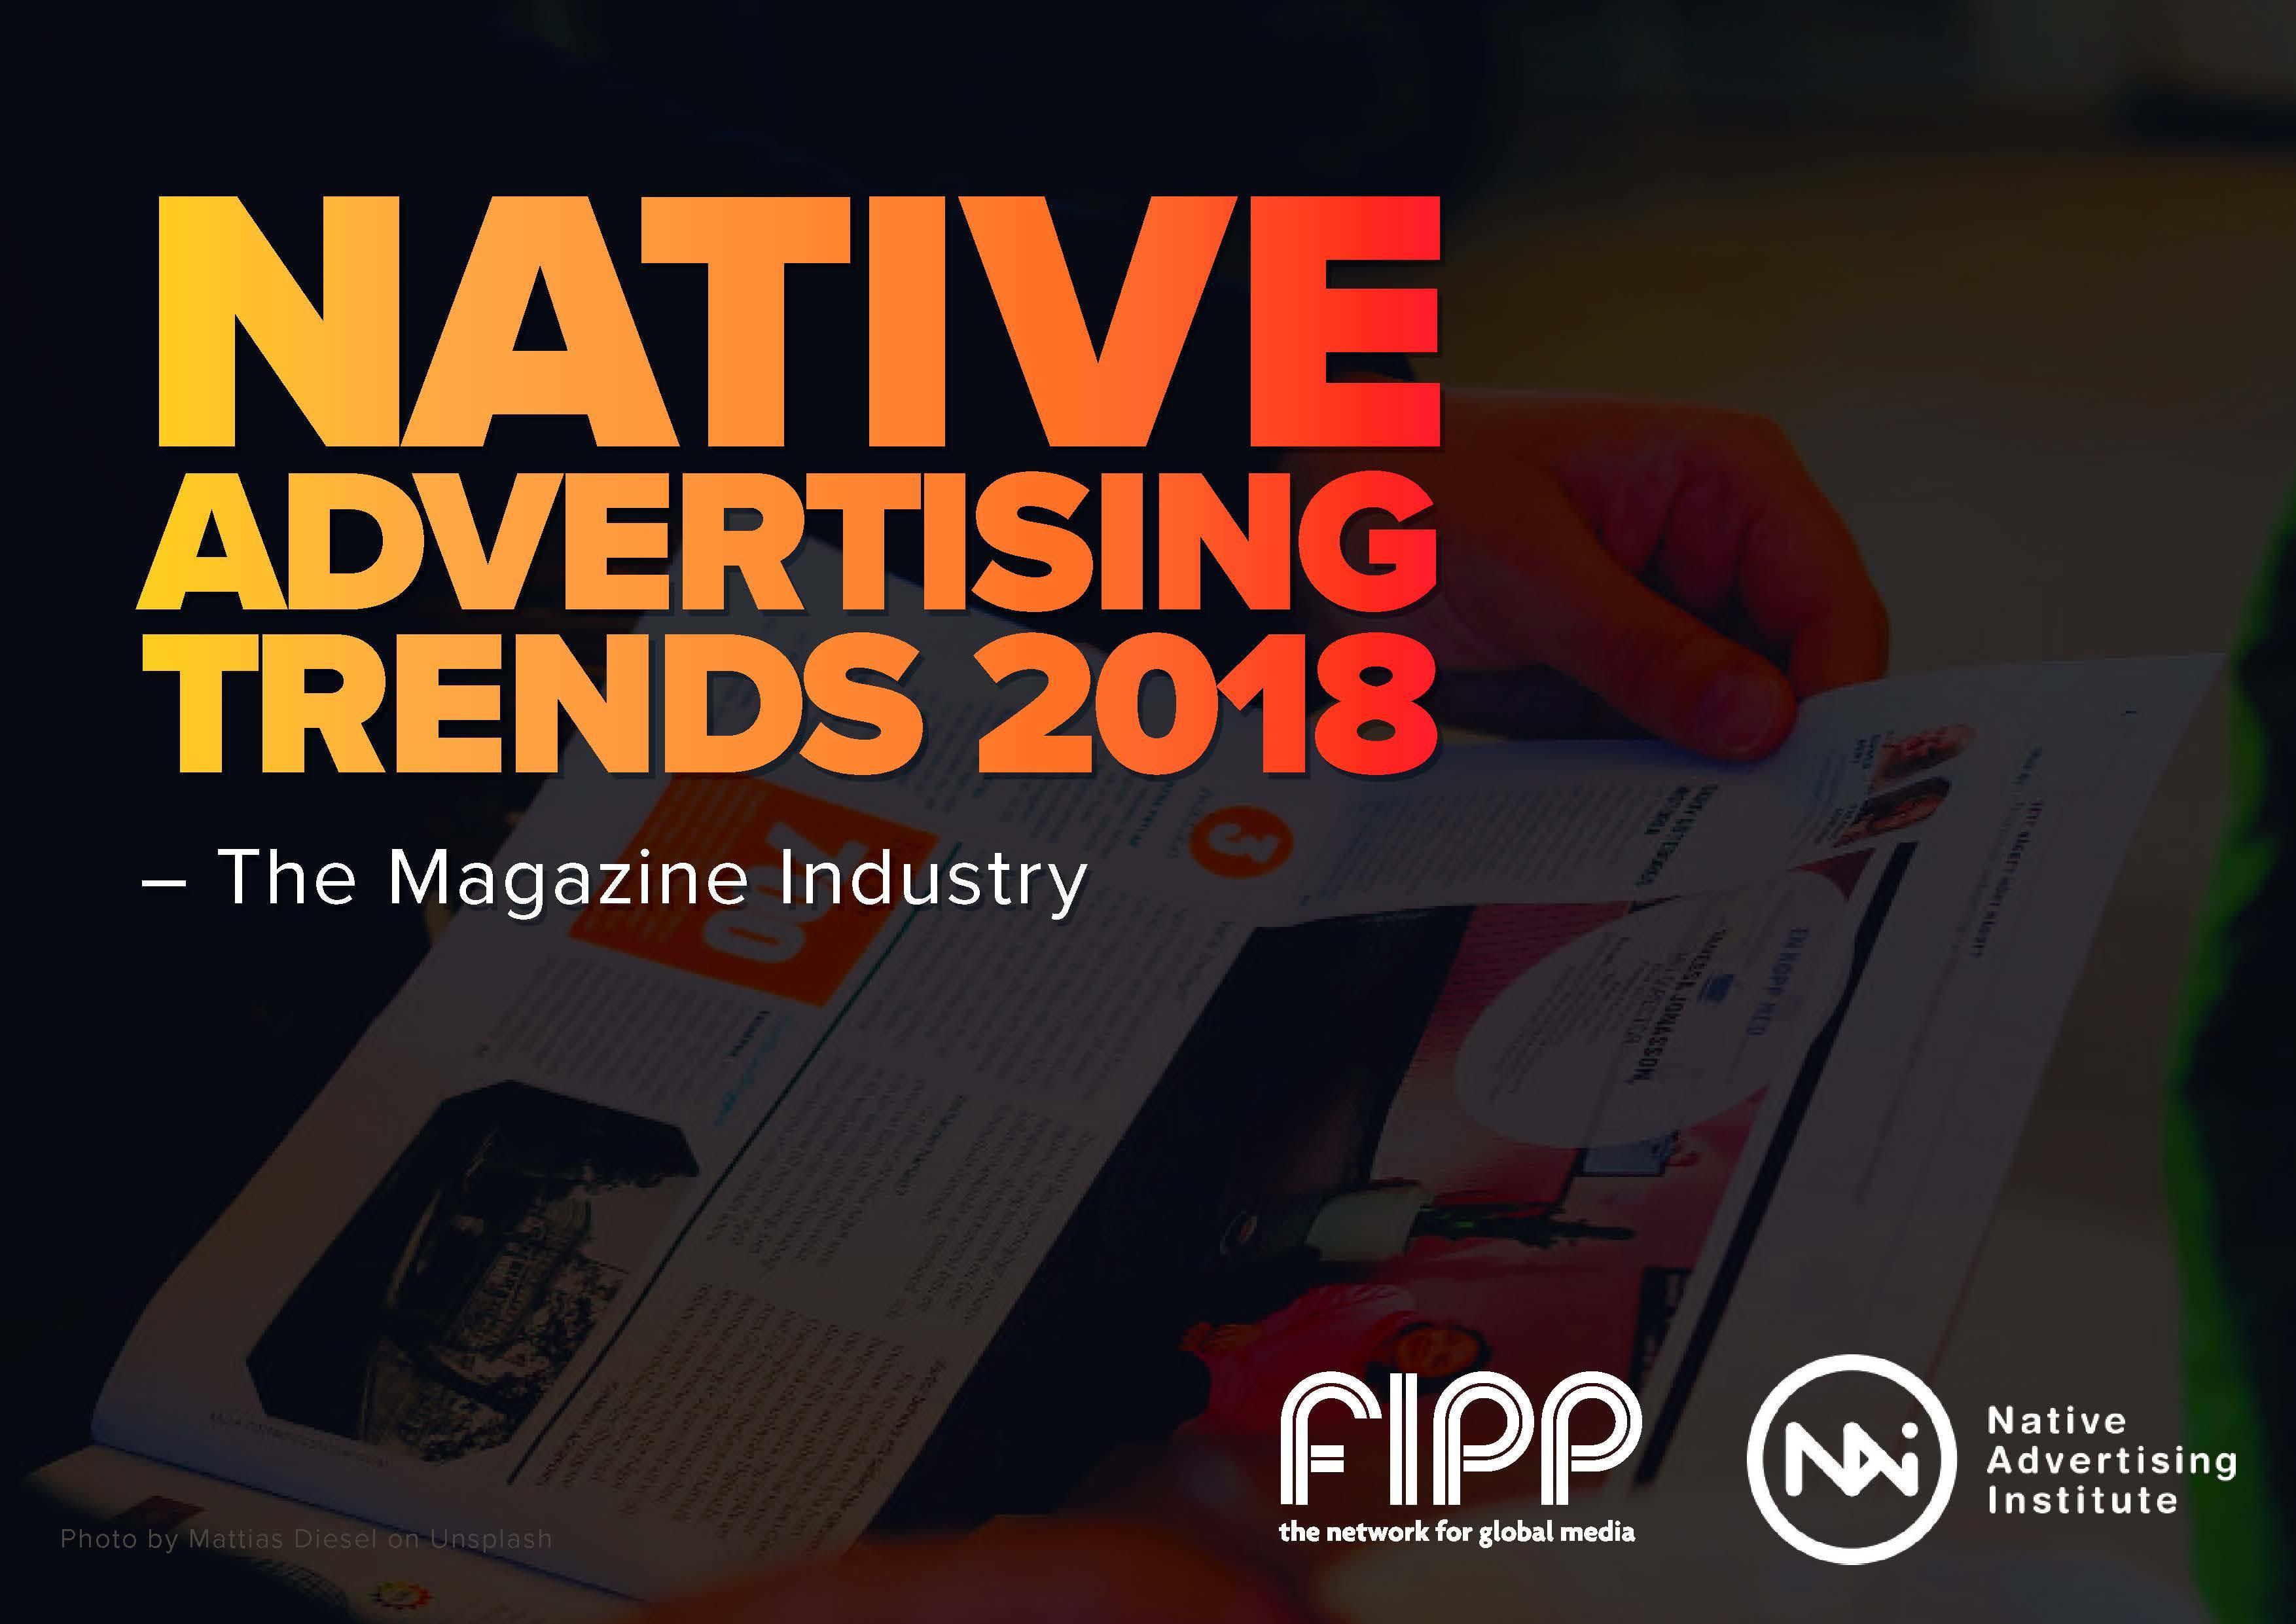 Native Advertising Trends 2018 (Native Advertising Institute/FIPP)